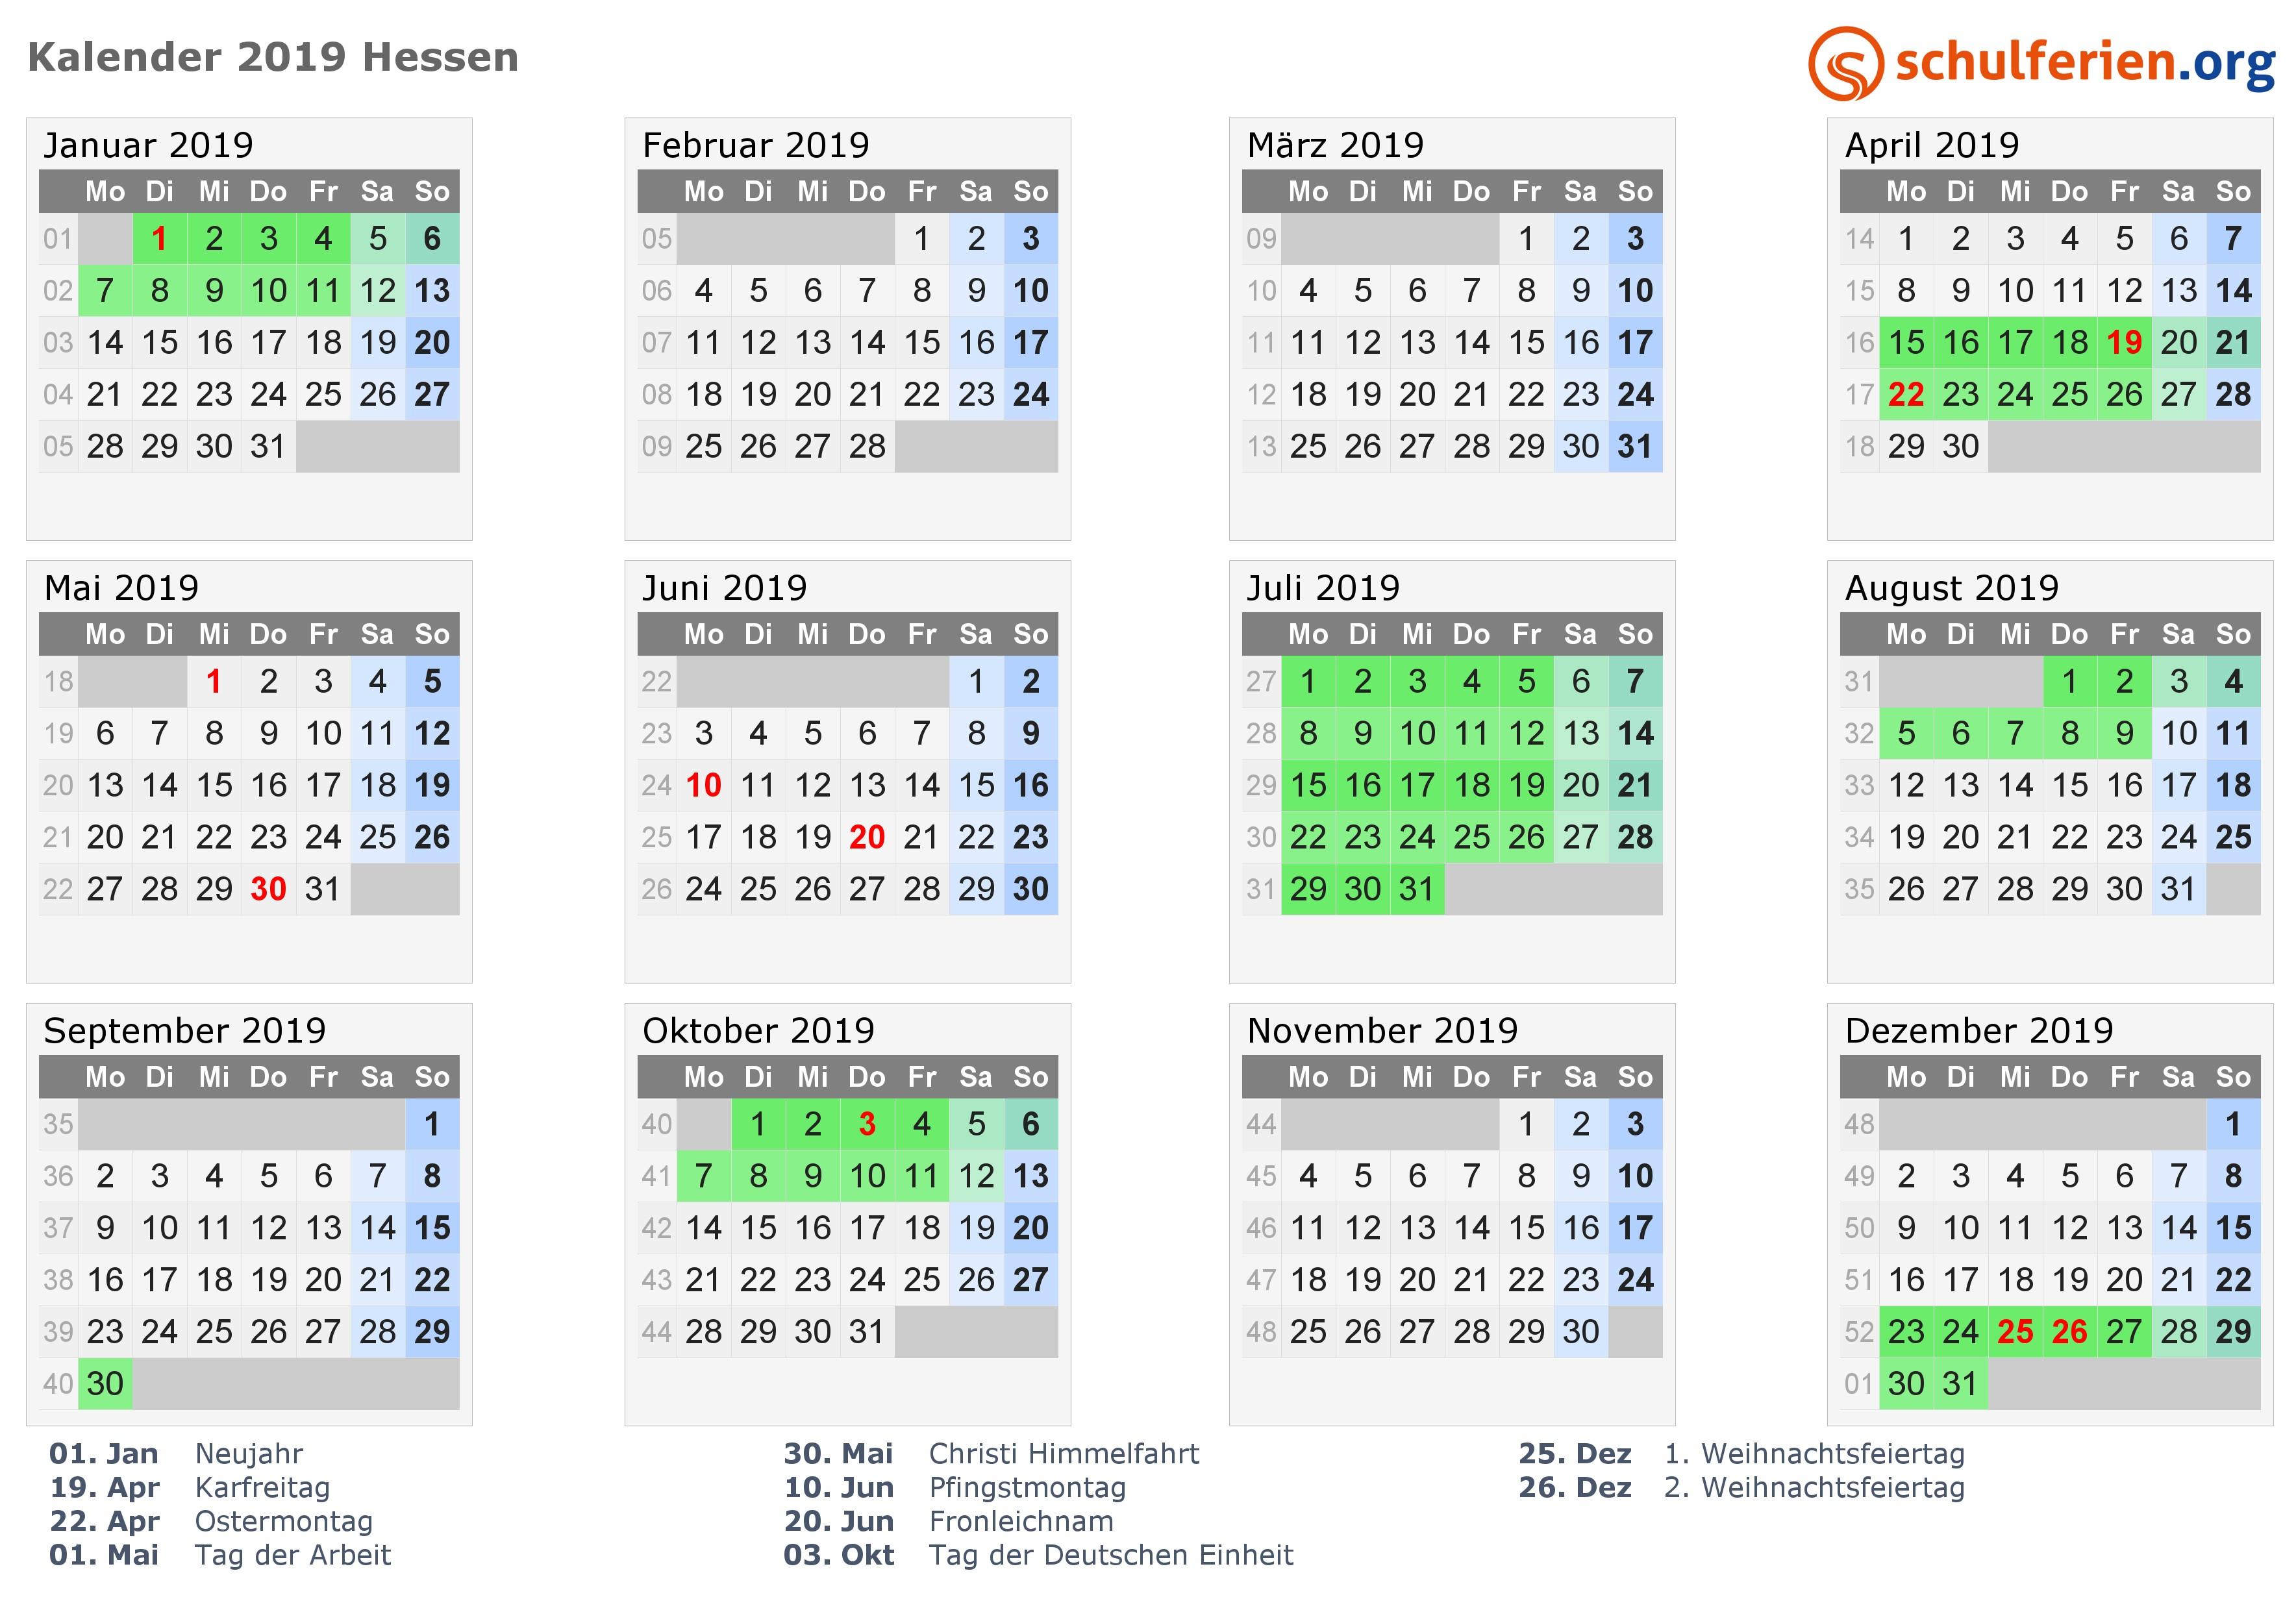 Kalender 2019 2020 Hessen